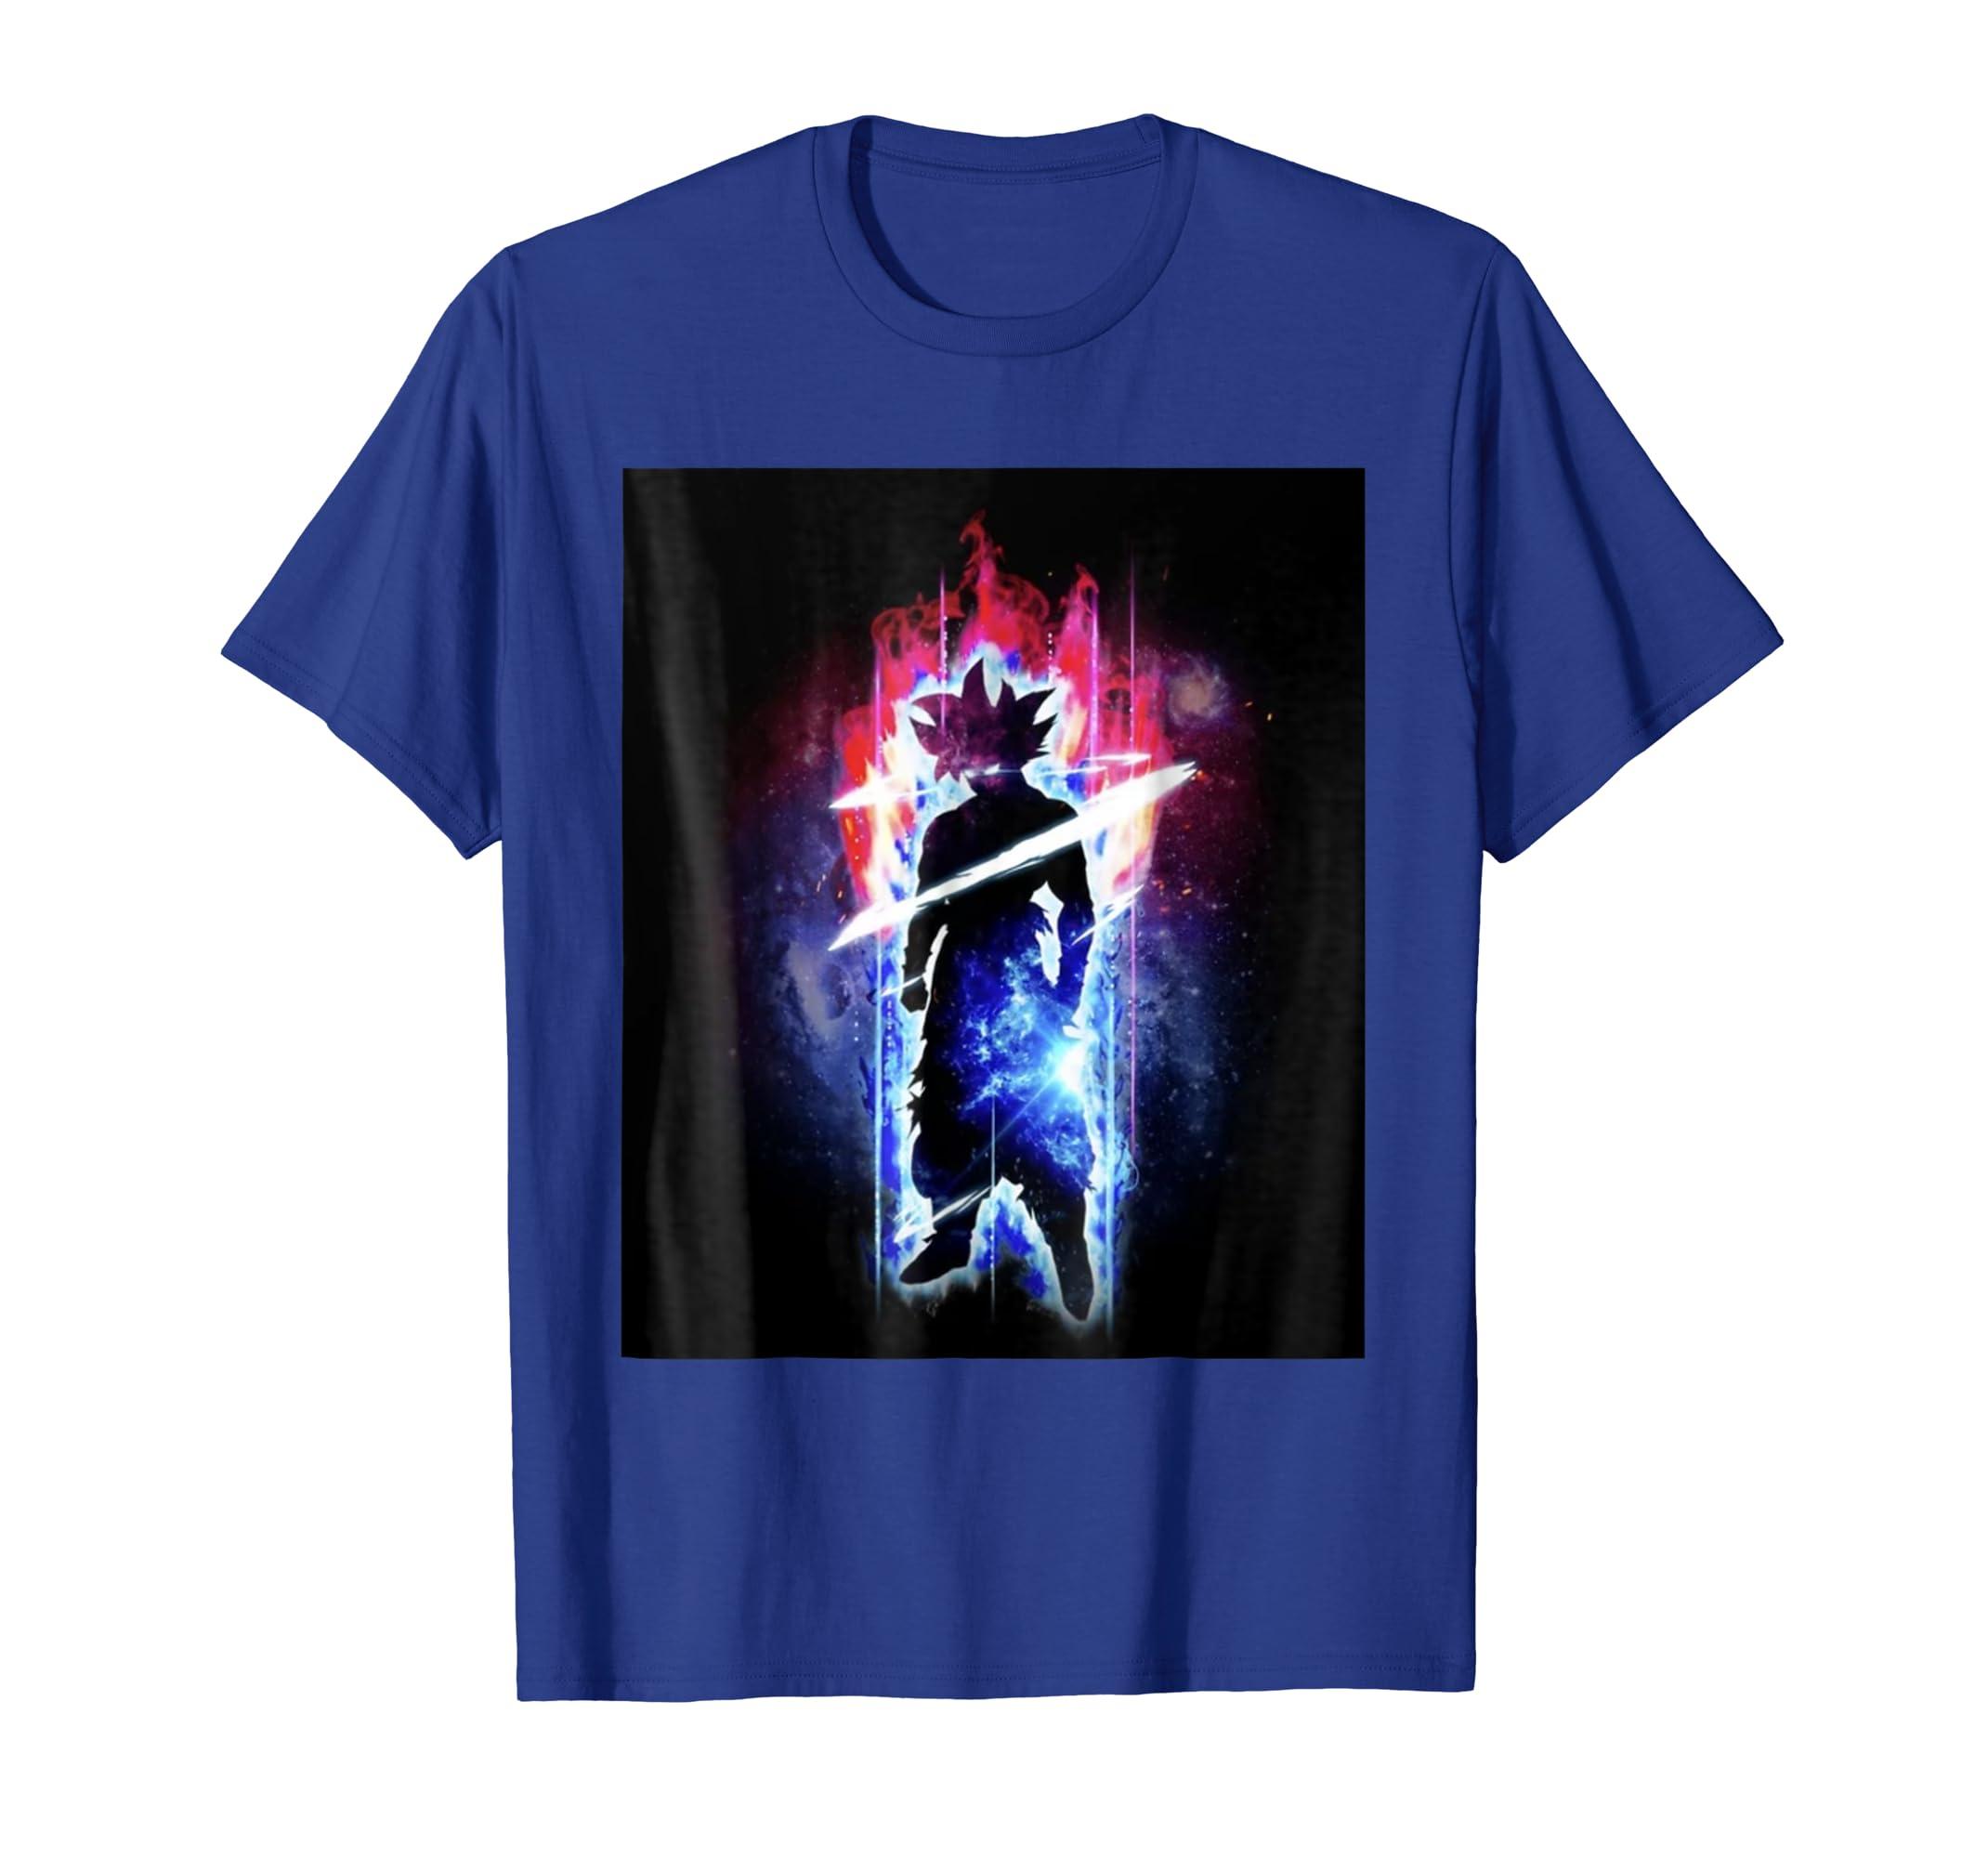 cf9917dc2f1 Amazon.com: Ultra Instinct Cosmic Aura (I will be back...): Clothing